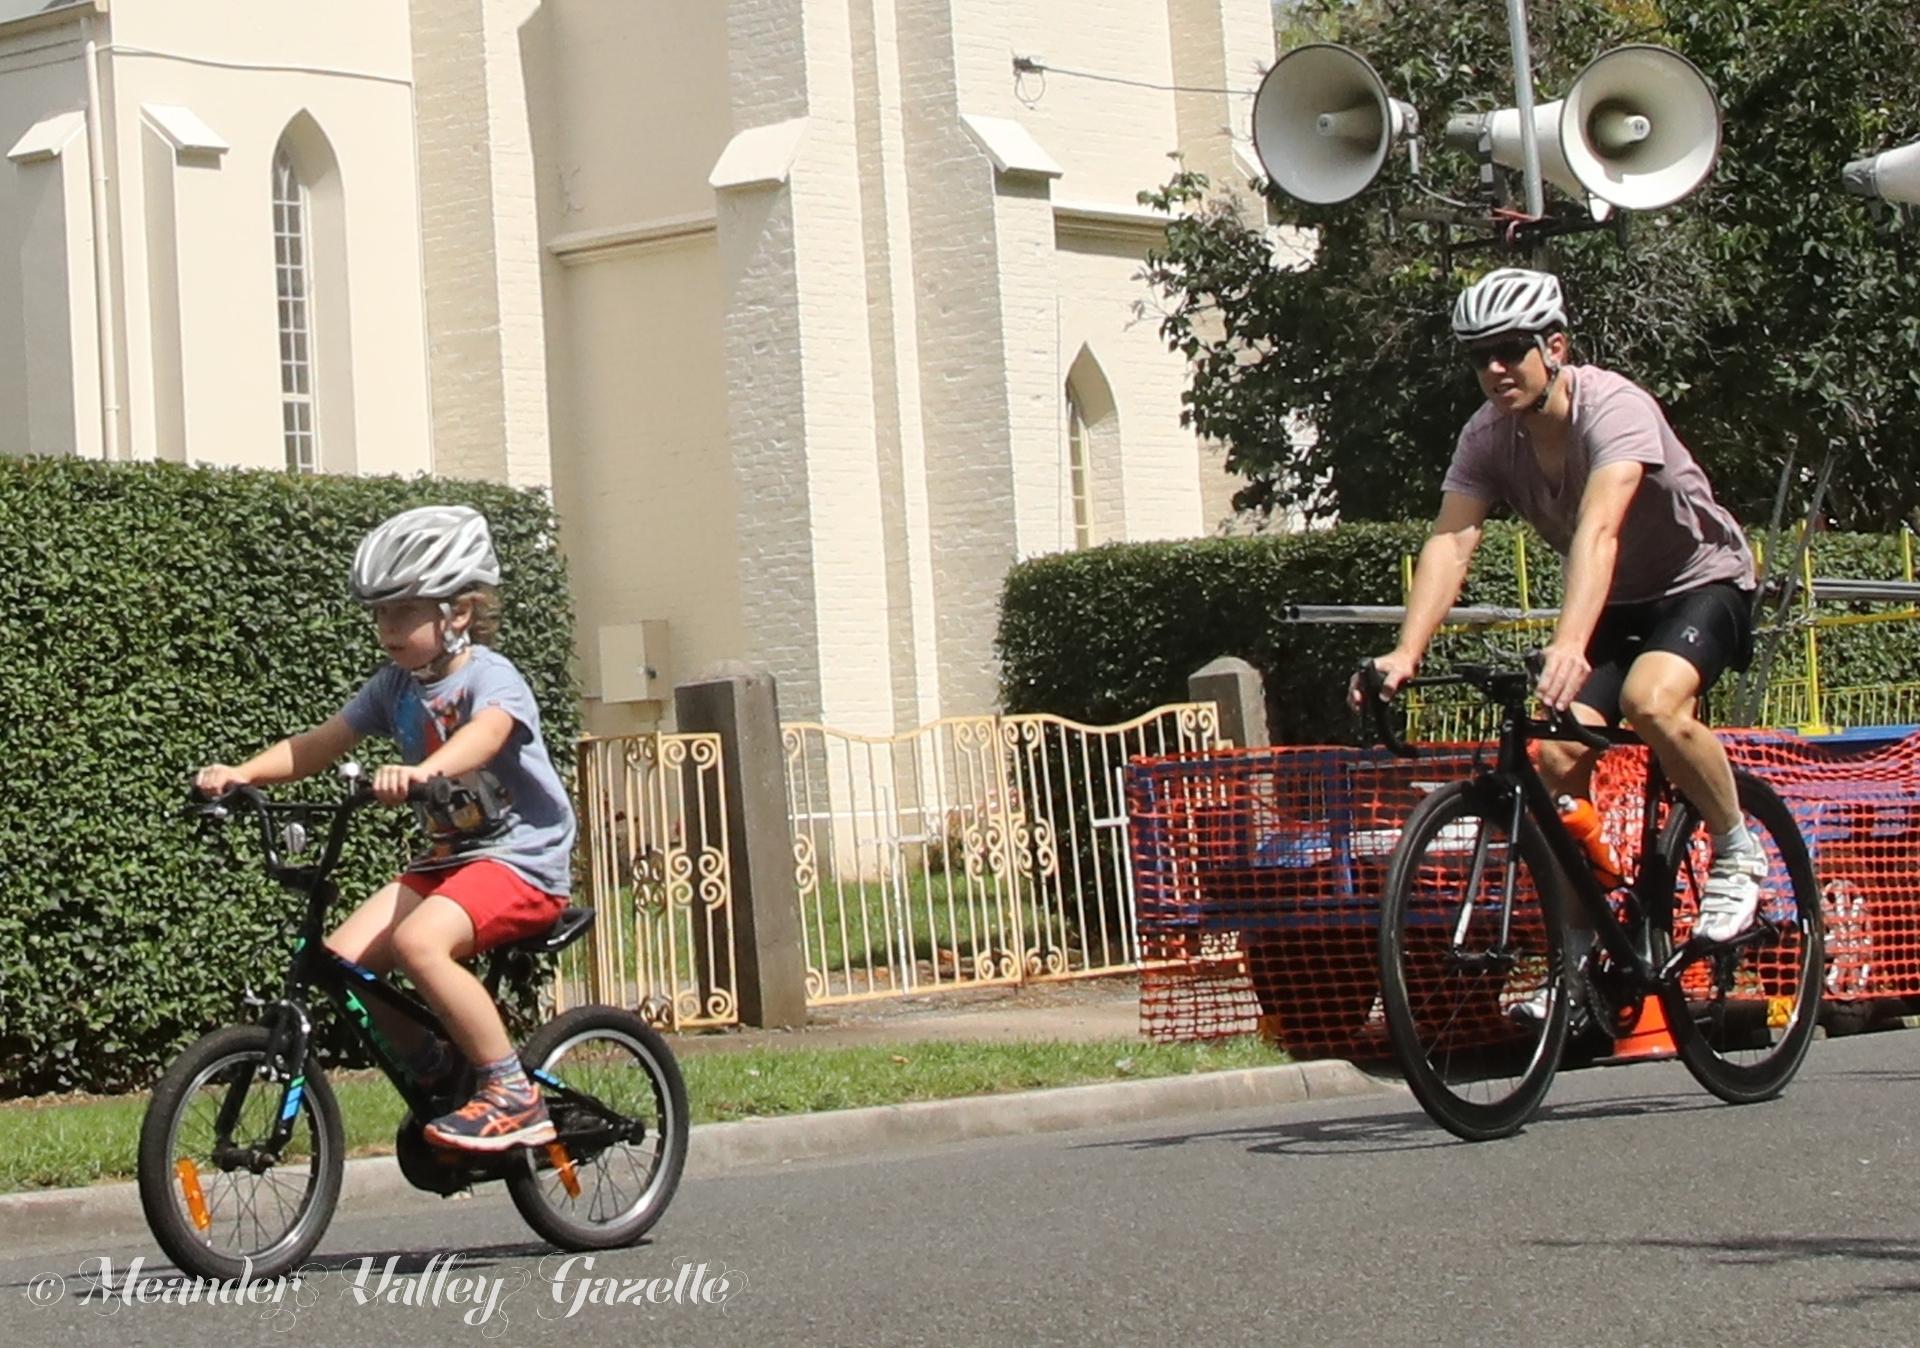 Kayne 7yrs enjoys the community ride with dad Greig Watson.